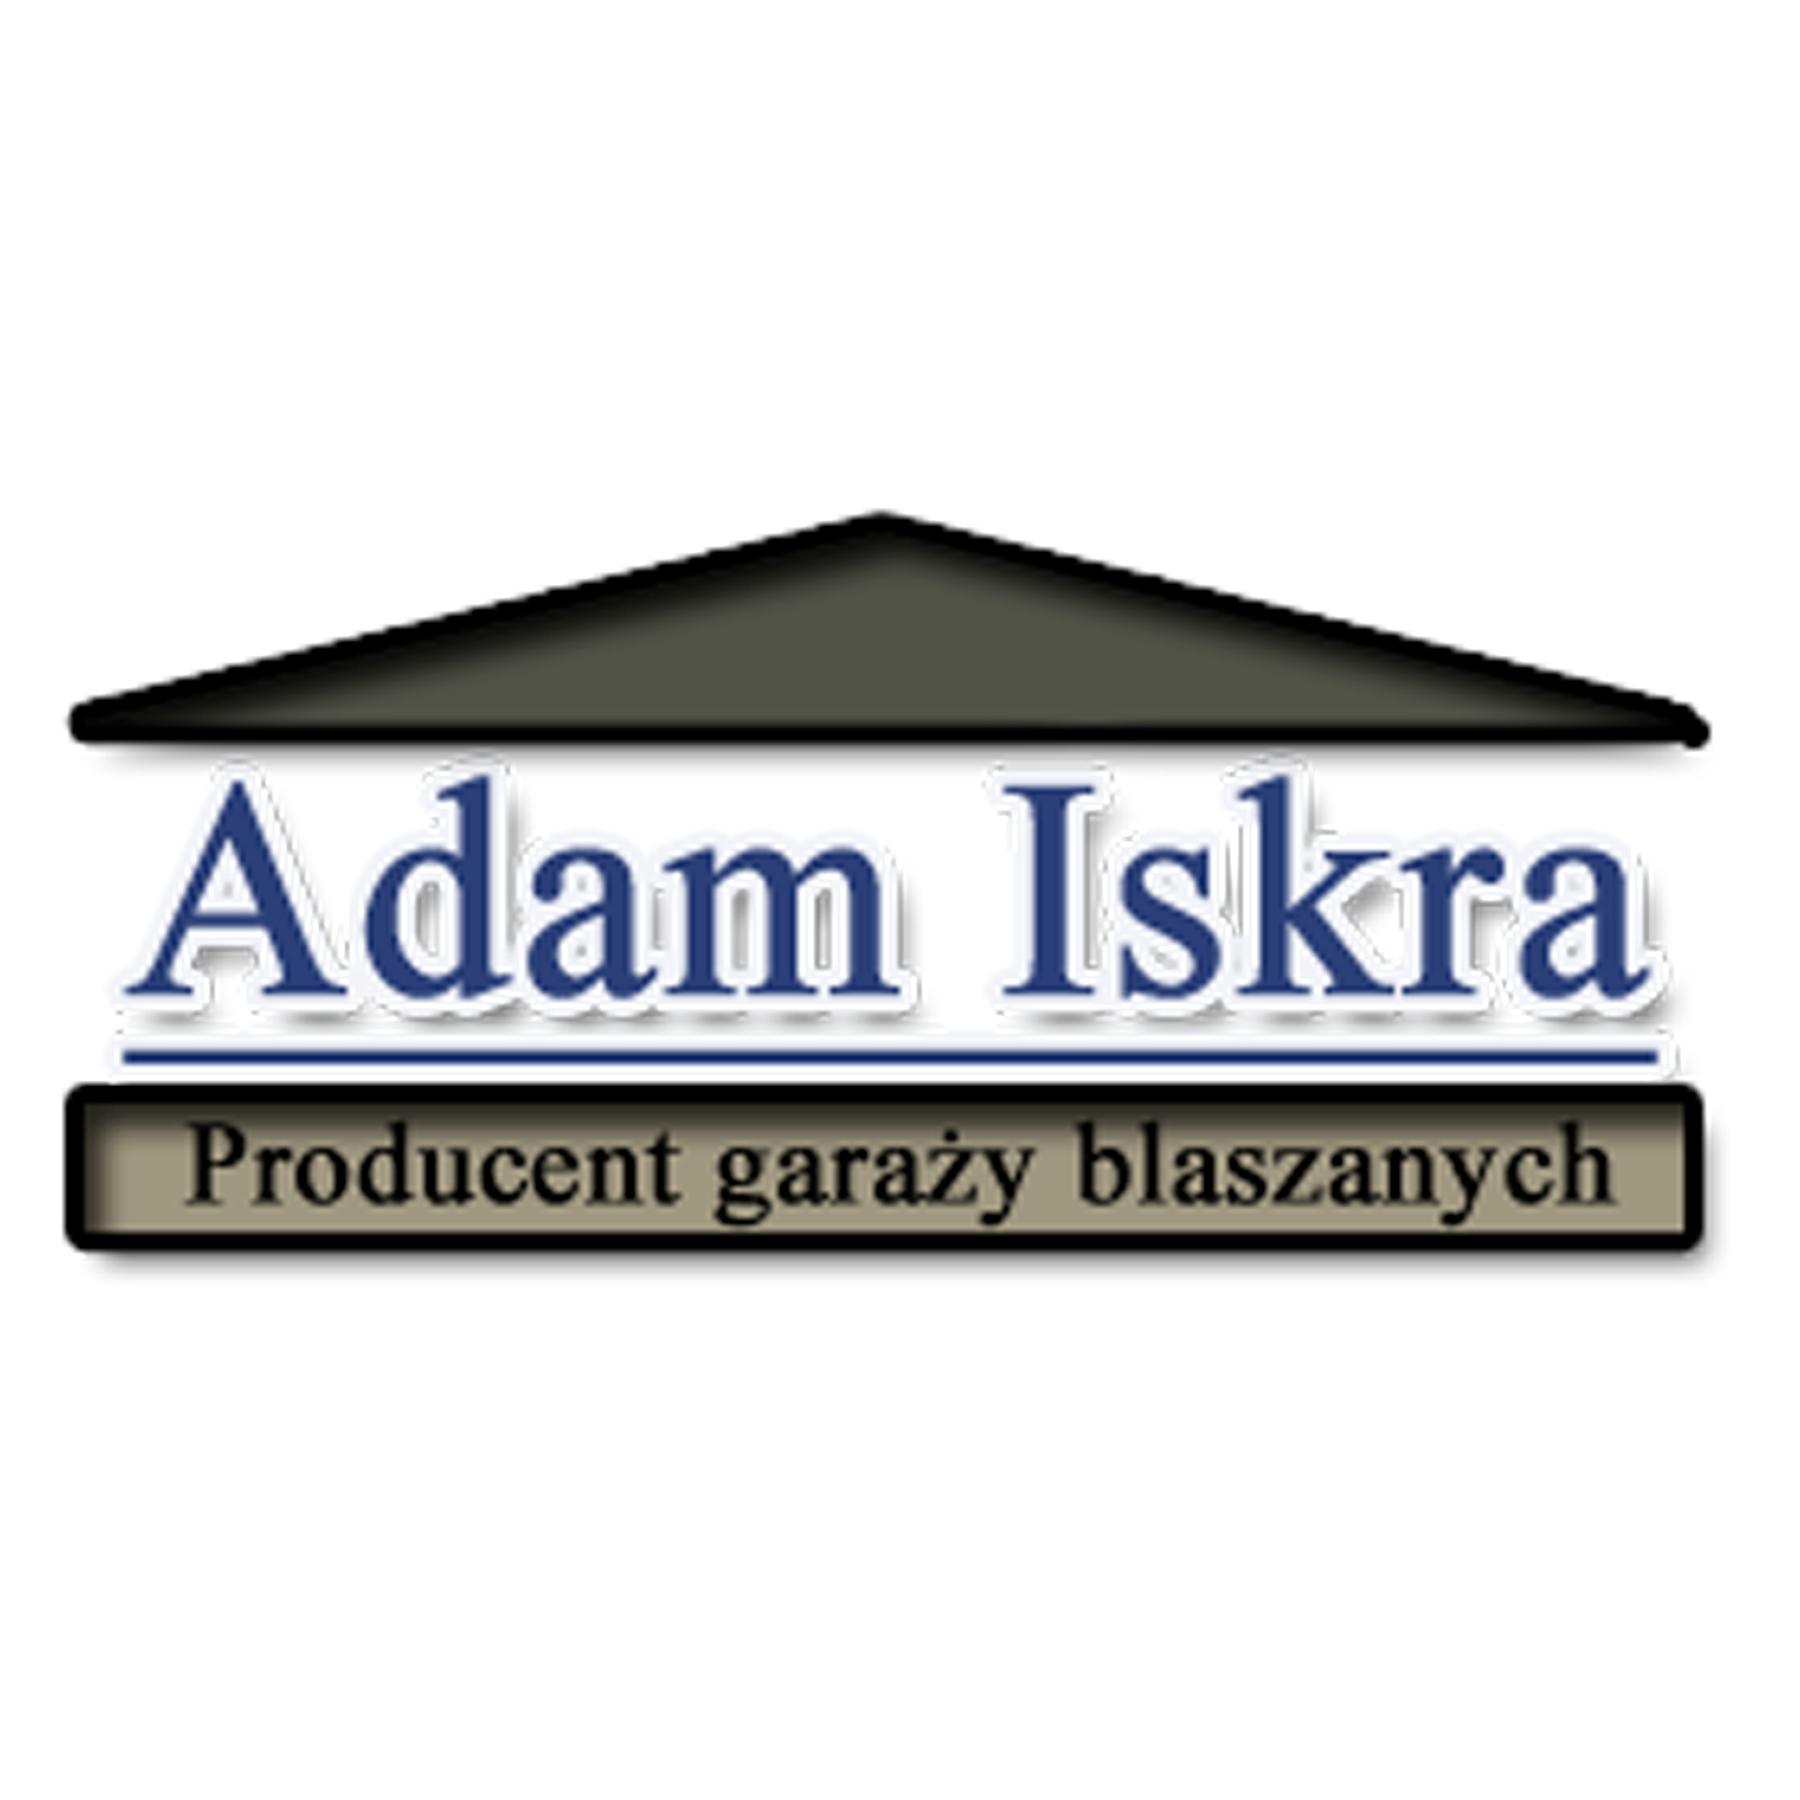 Garaże Blaszane Adam Iskra